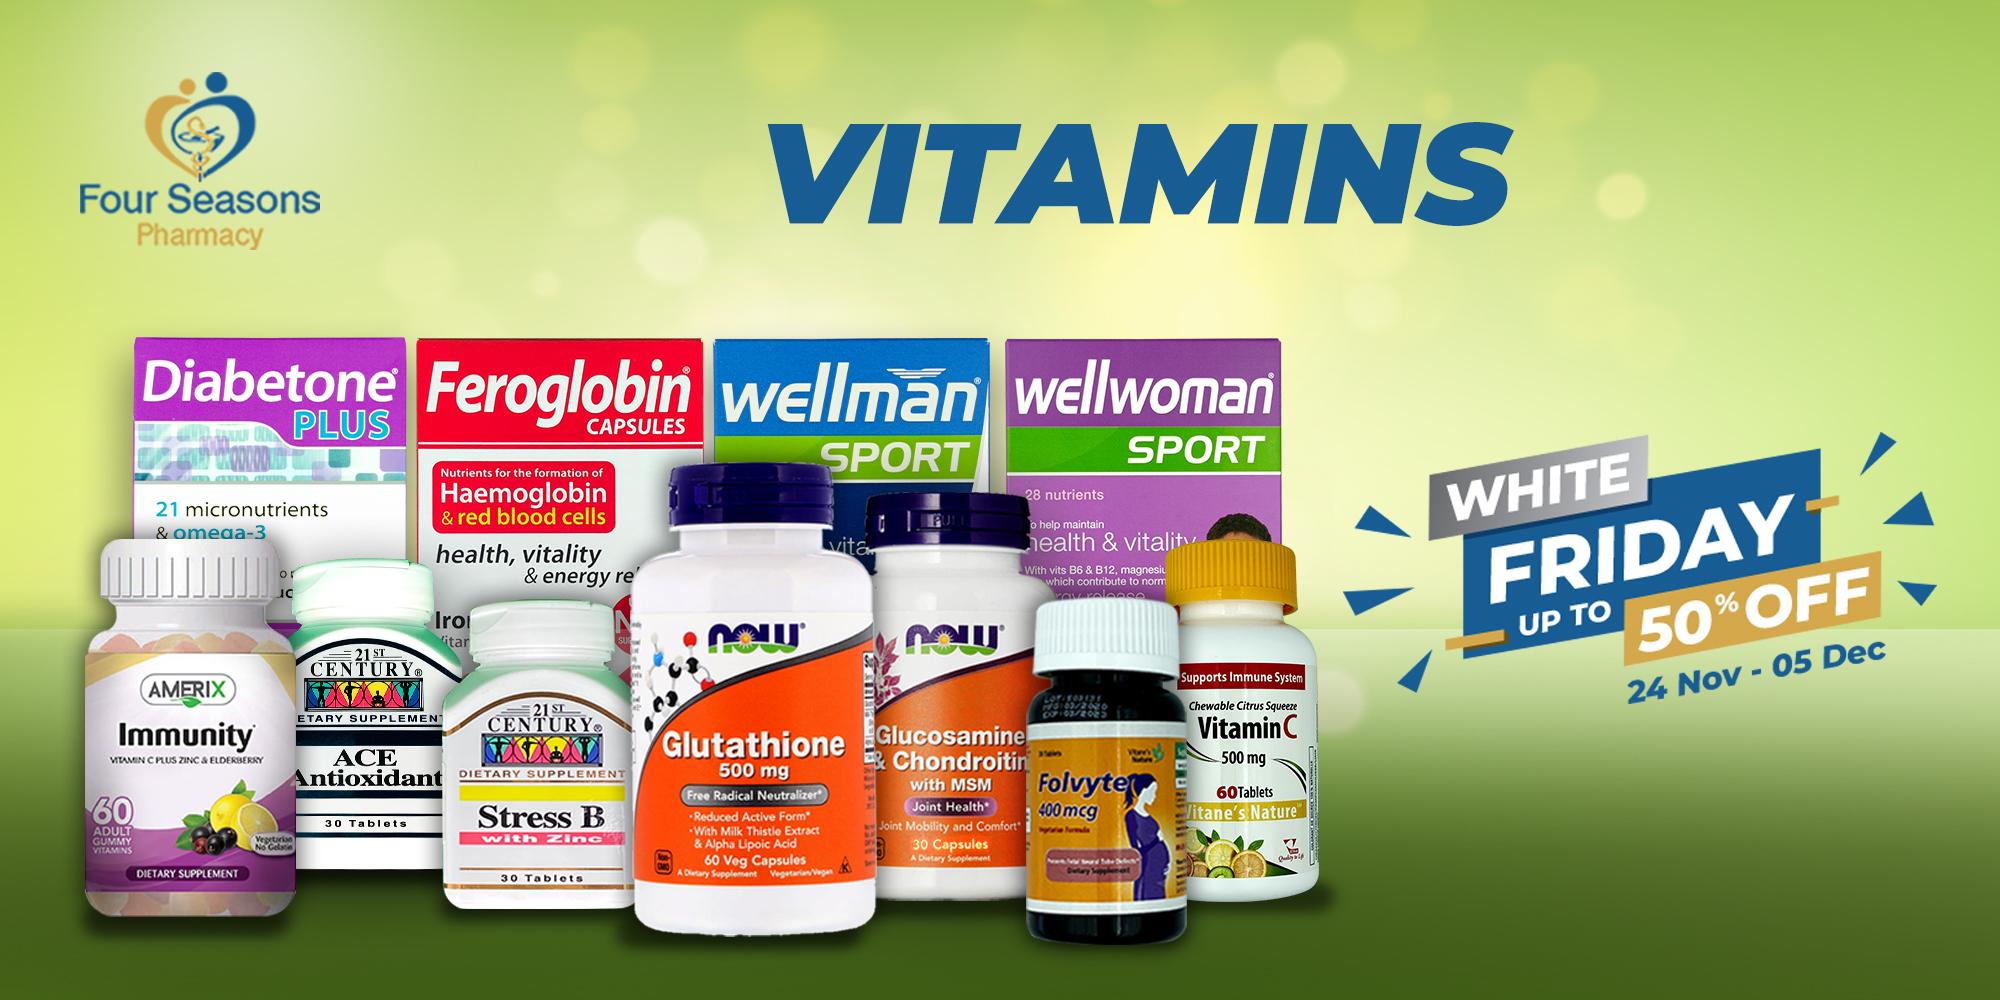 Vitamins - Upto 50% Off